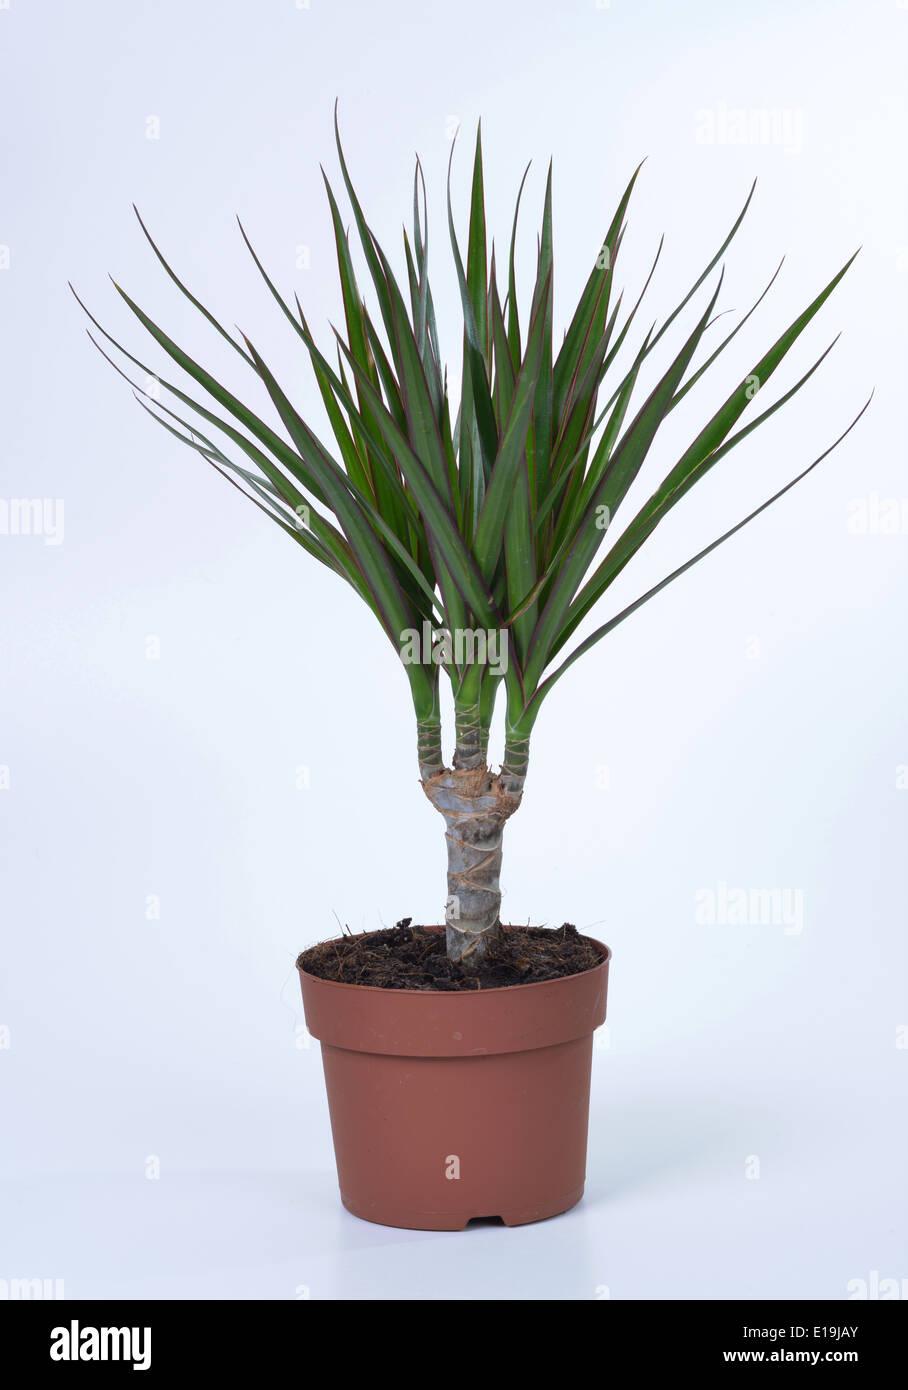 Drachenbaum Dracaena Marginata Stock Photo 69668115 Alamy